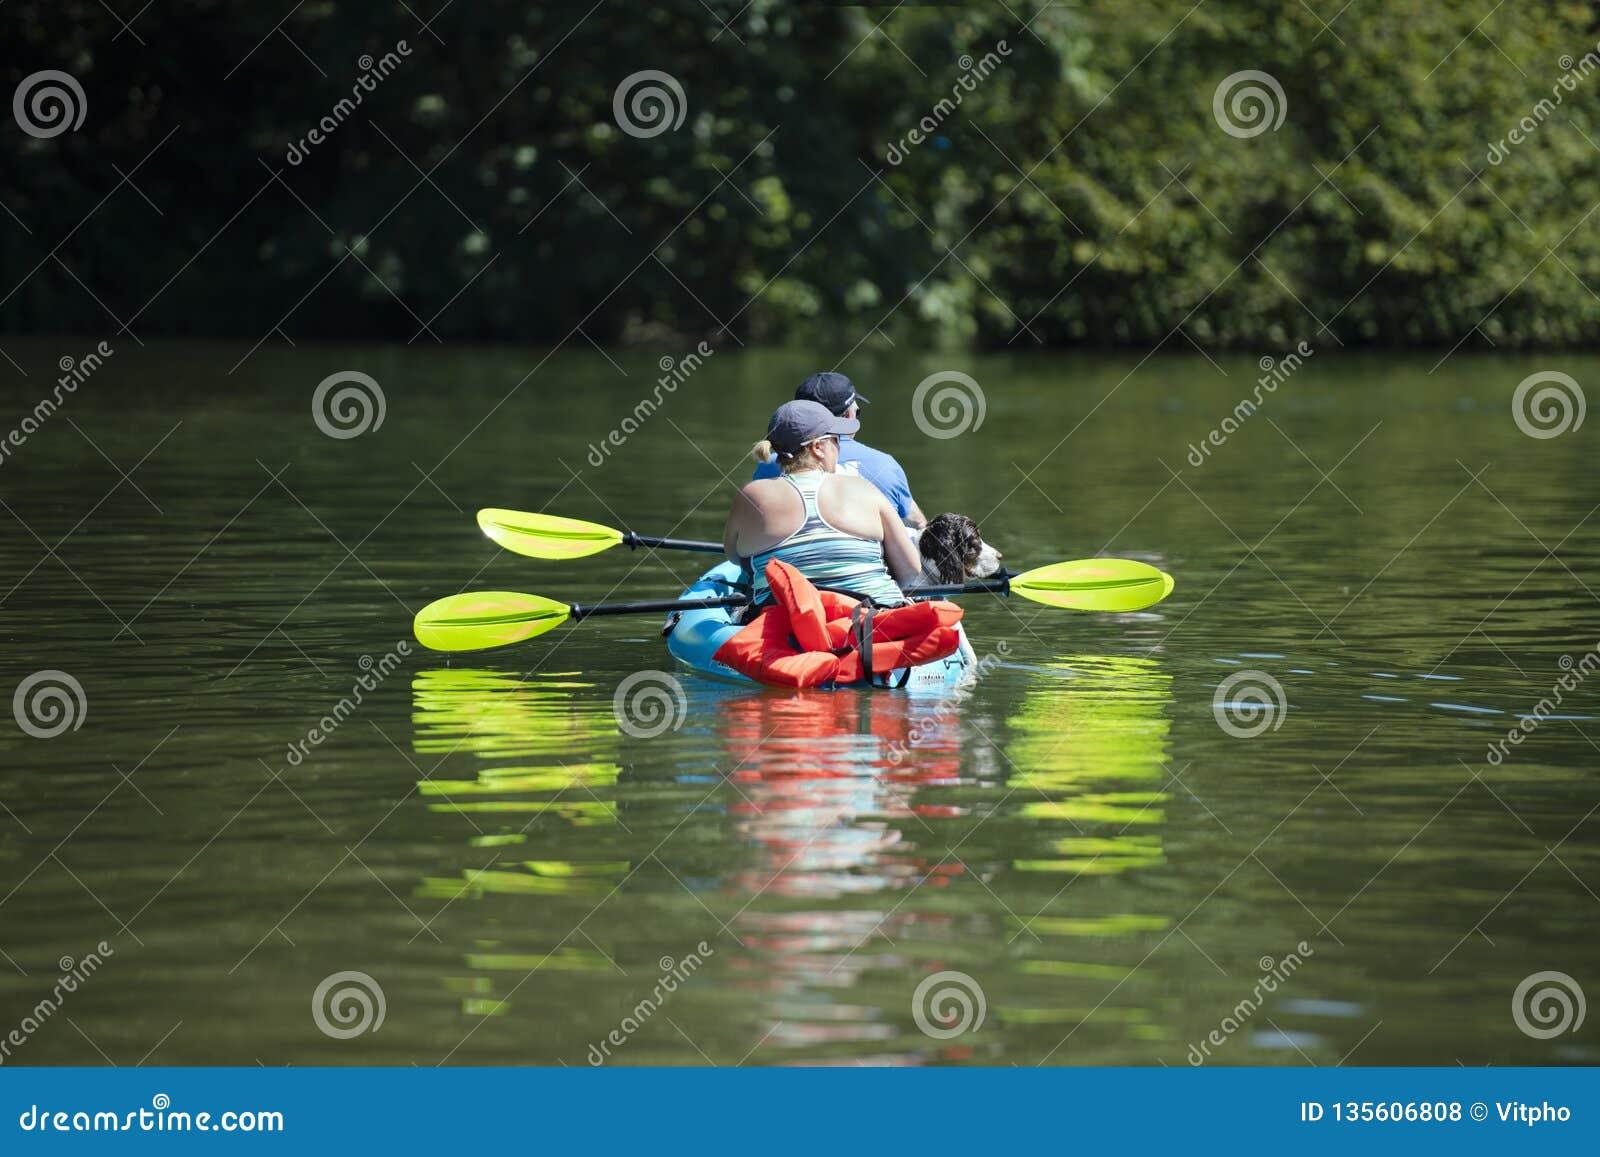 Man Woman And Dog Rowing On Kayak On Quiet Lacamas Lake